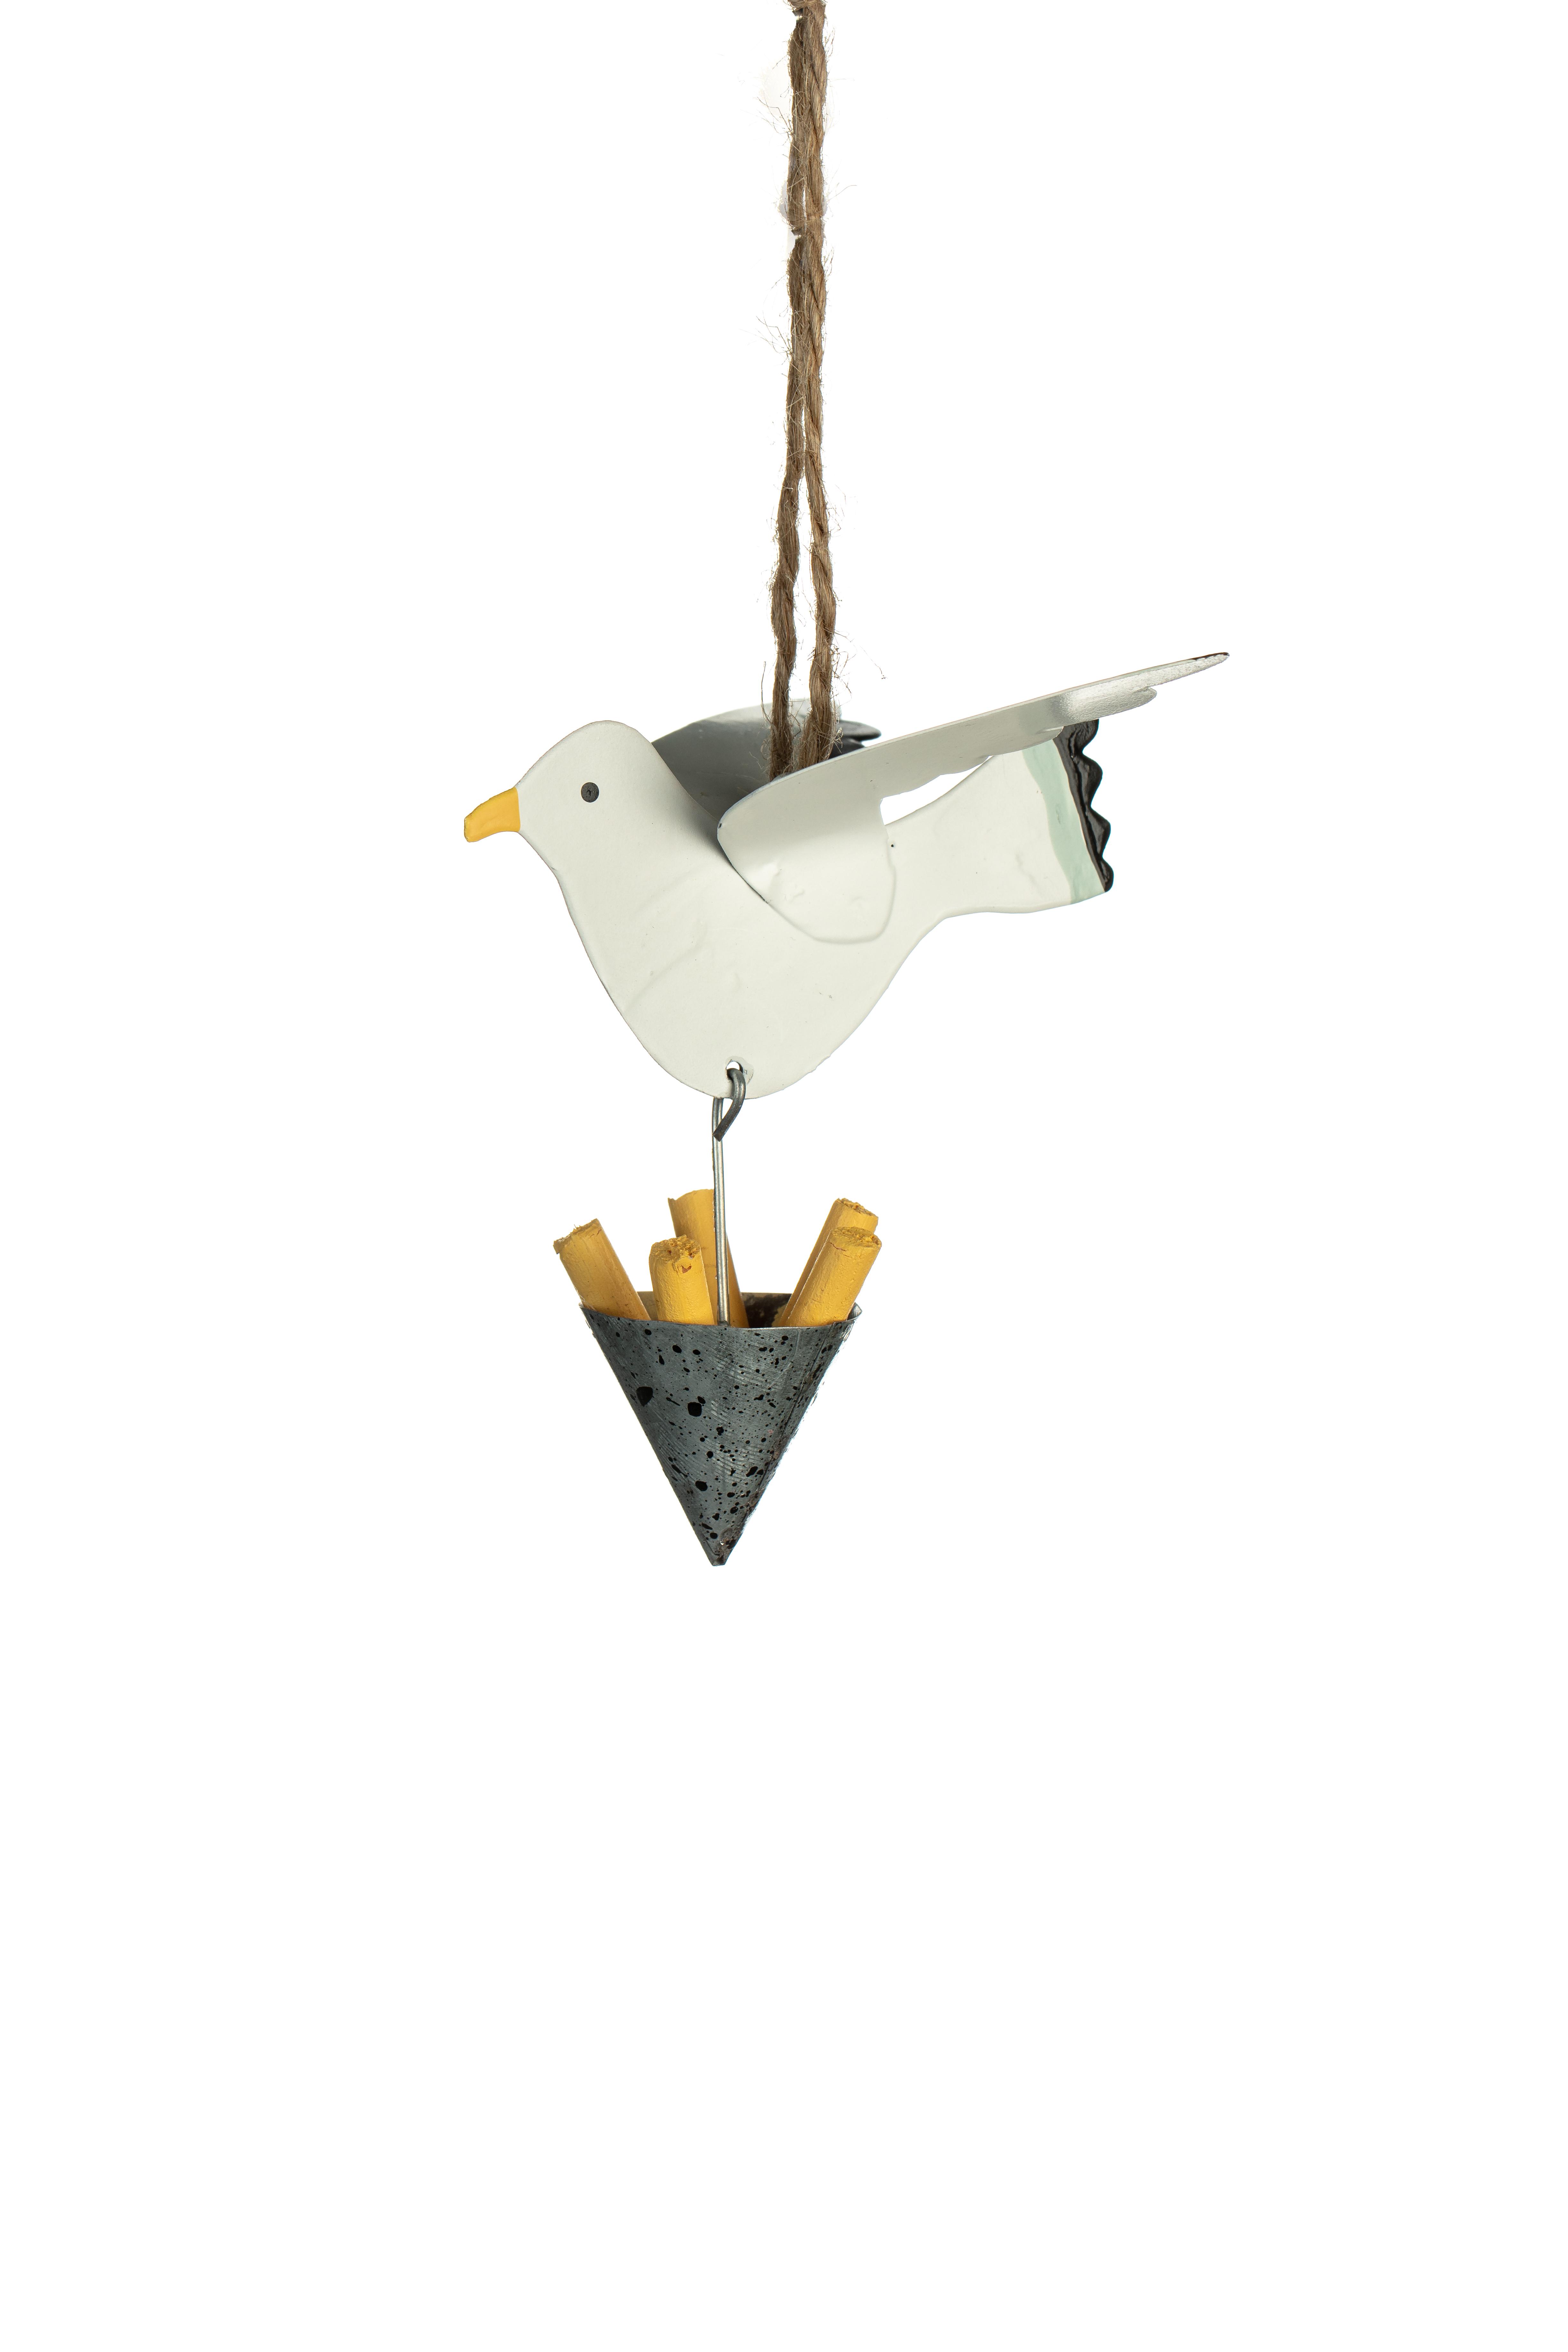 Seagull Stealing Chips Hanger